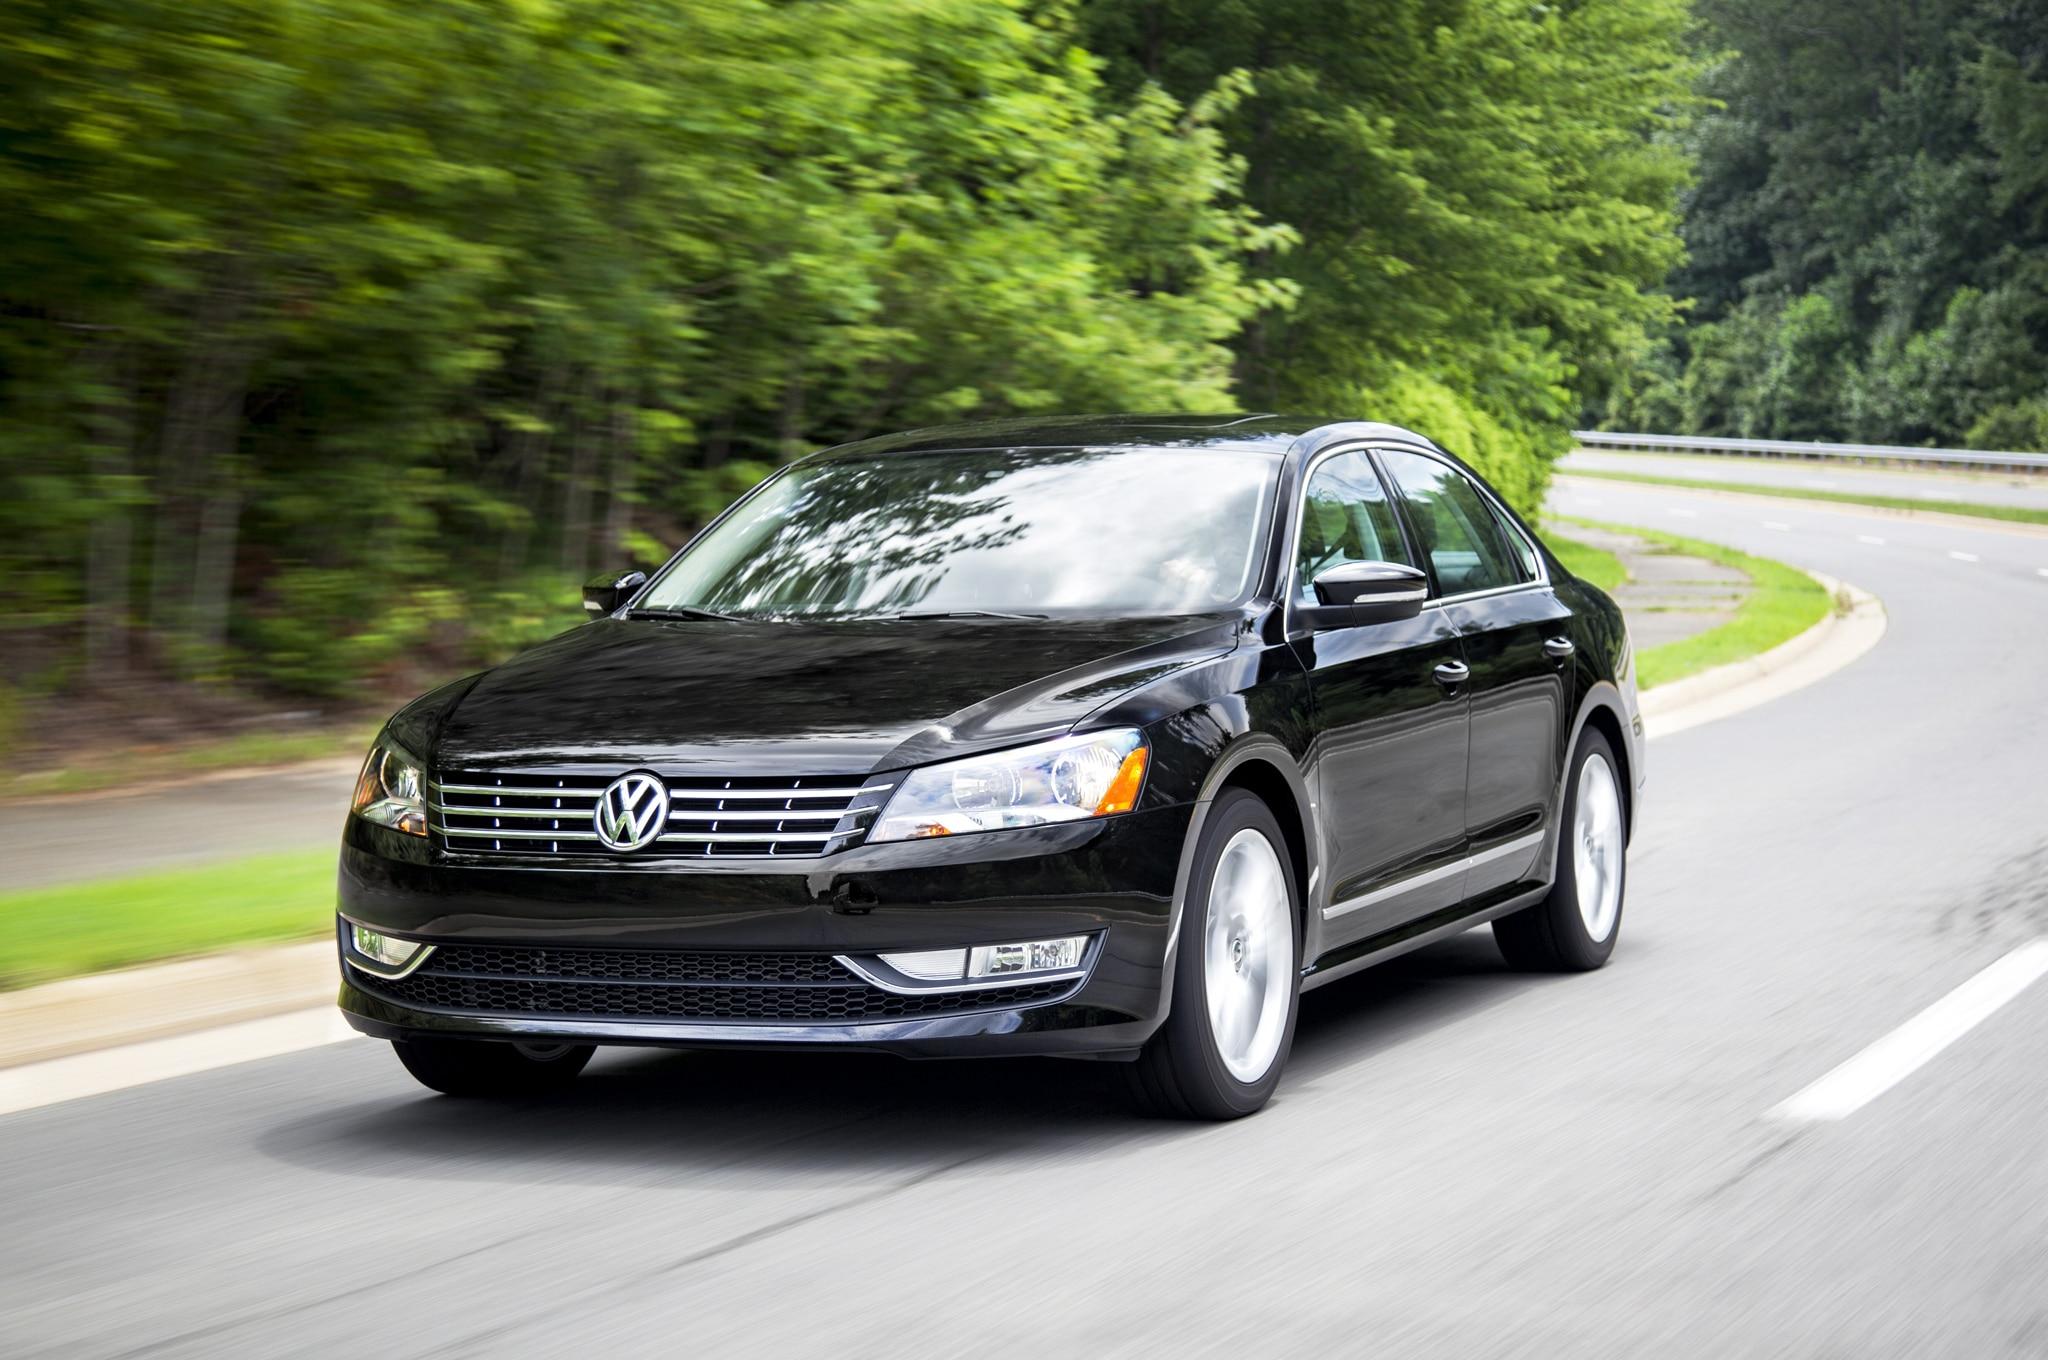 2015 Volkswagen Passat Limited Edition Replaces SE